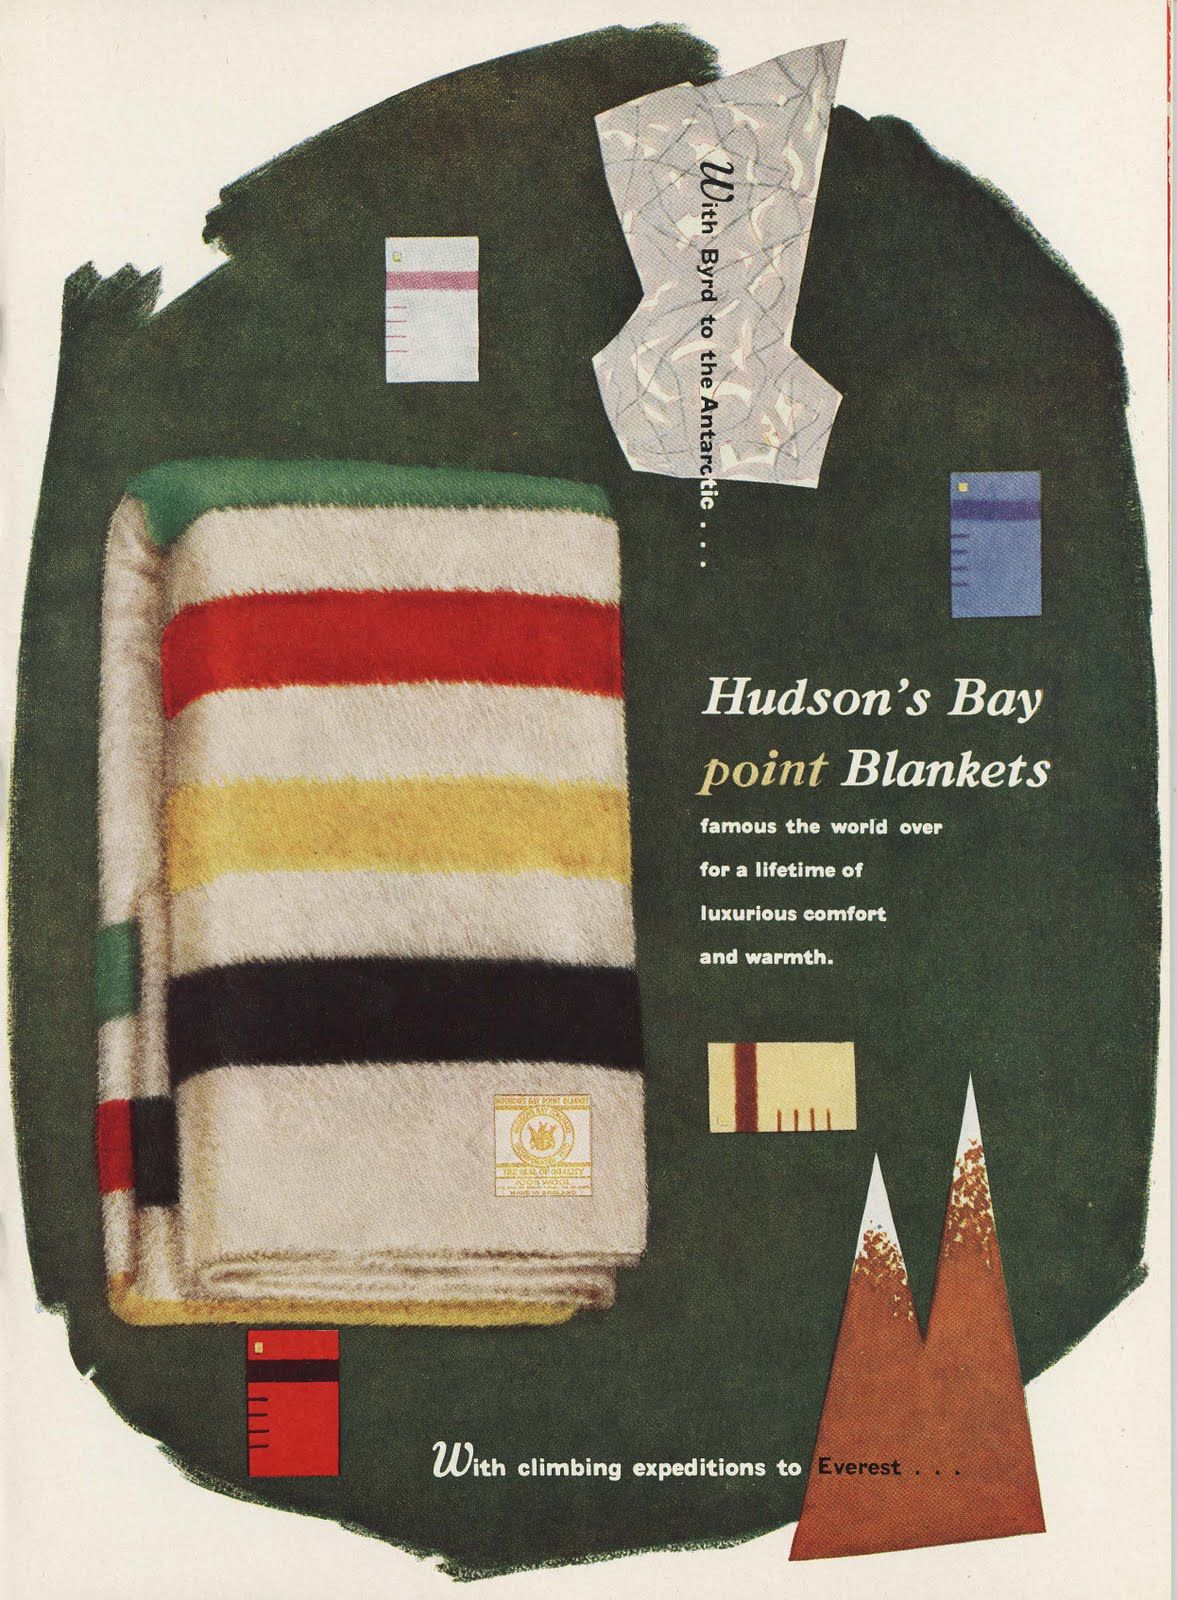 Hudson bay point blanket dating site